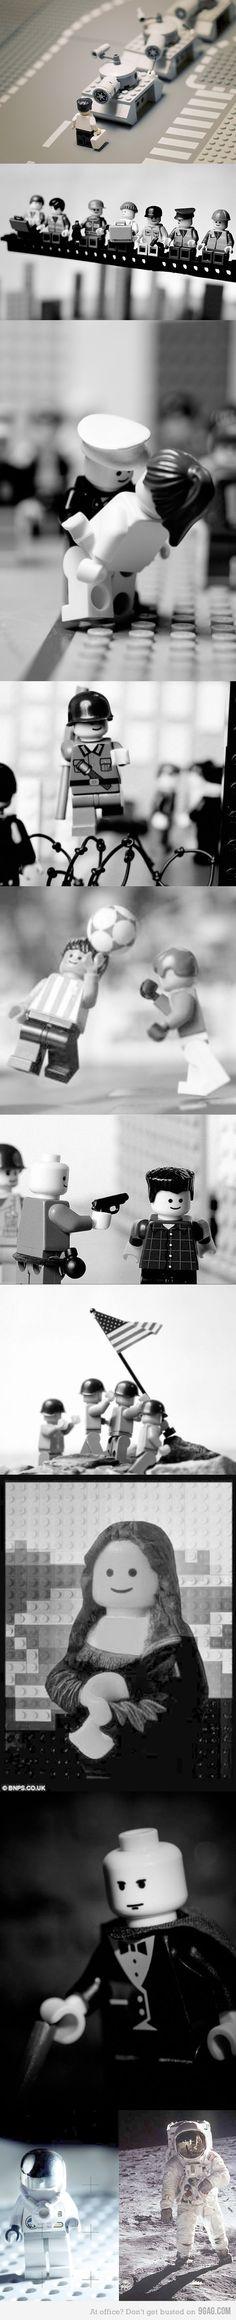 Lego recreation of famous pics